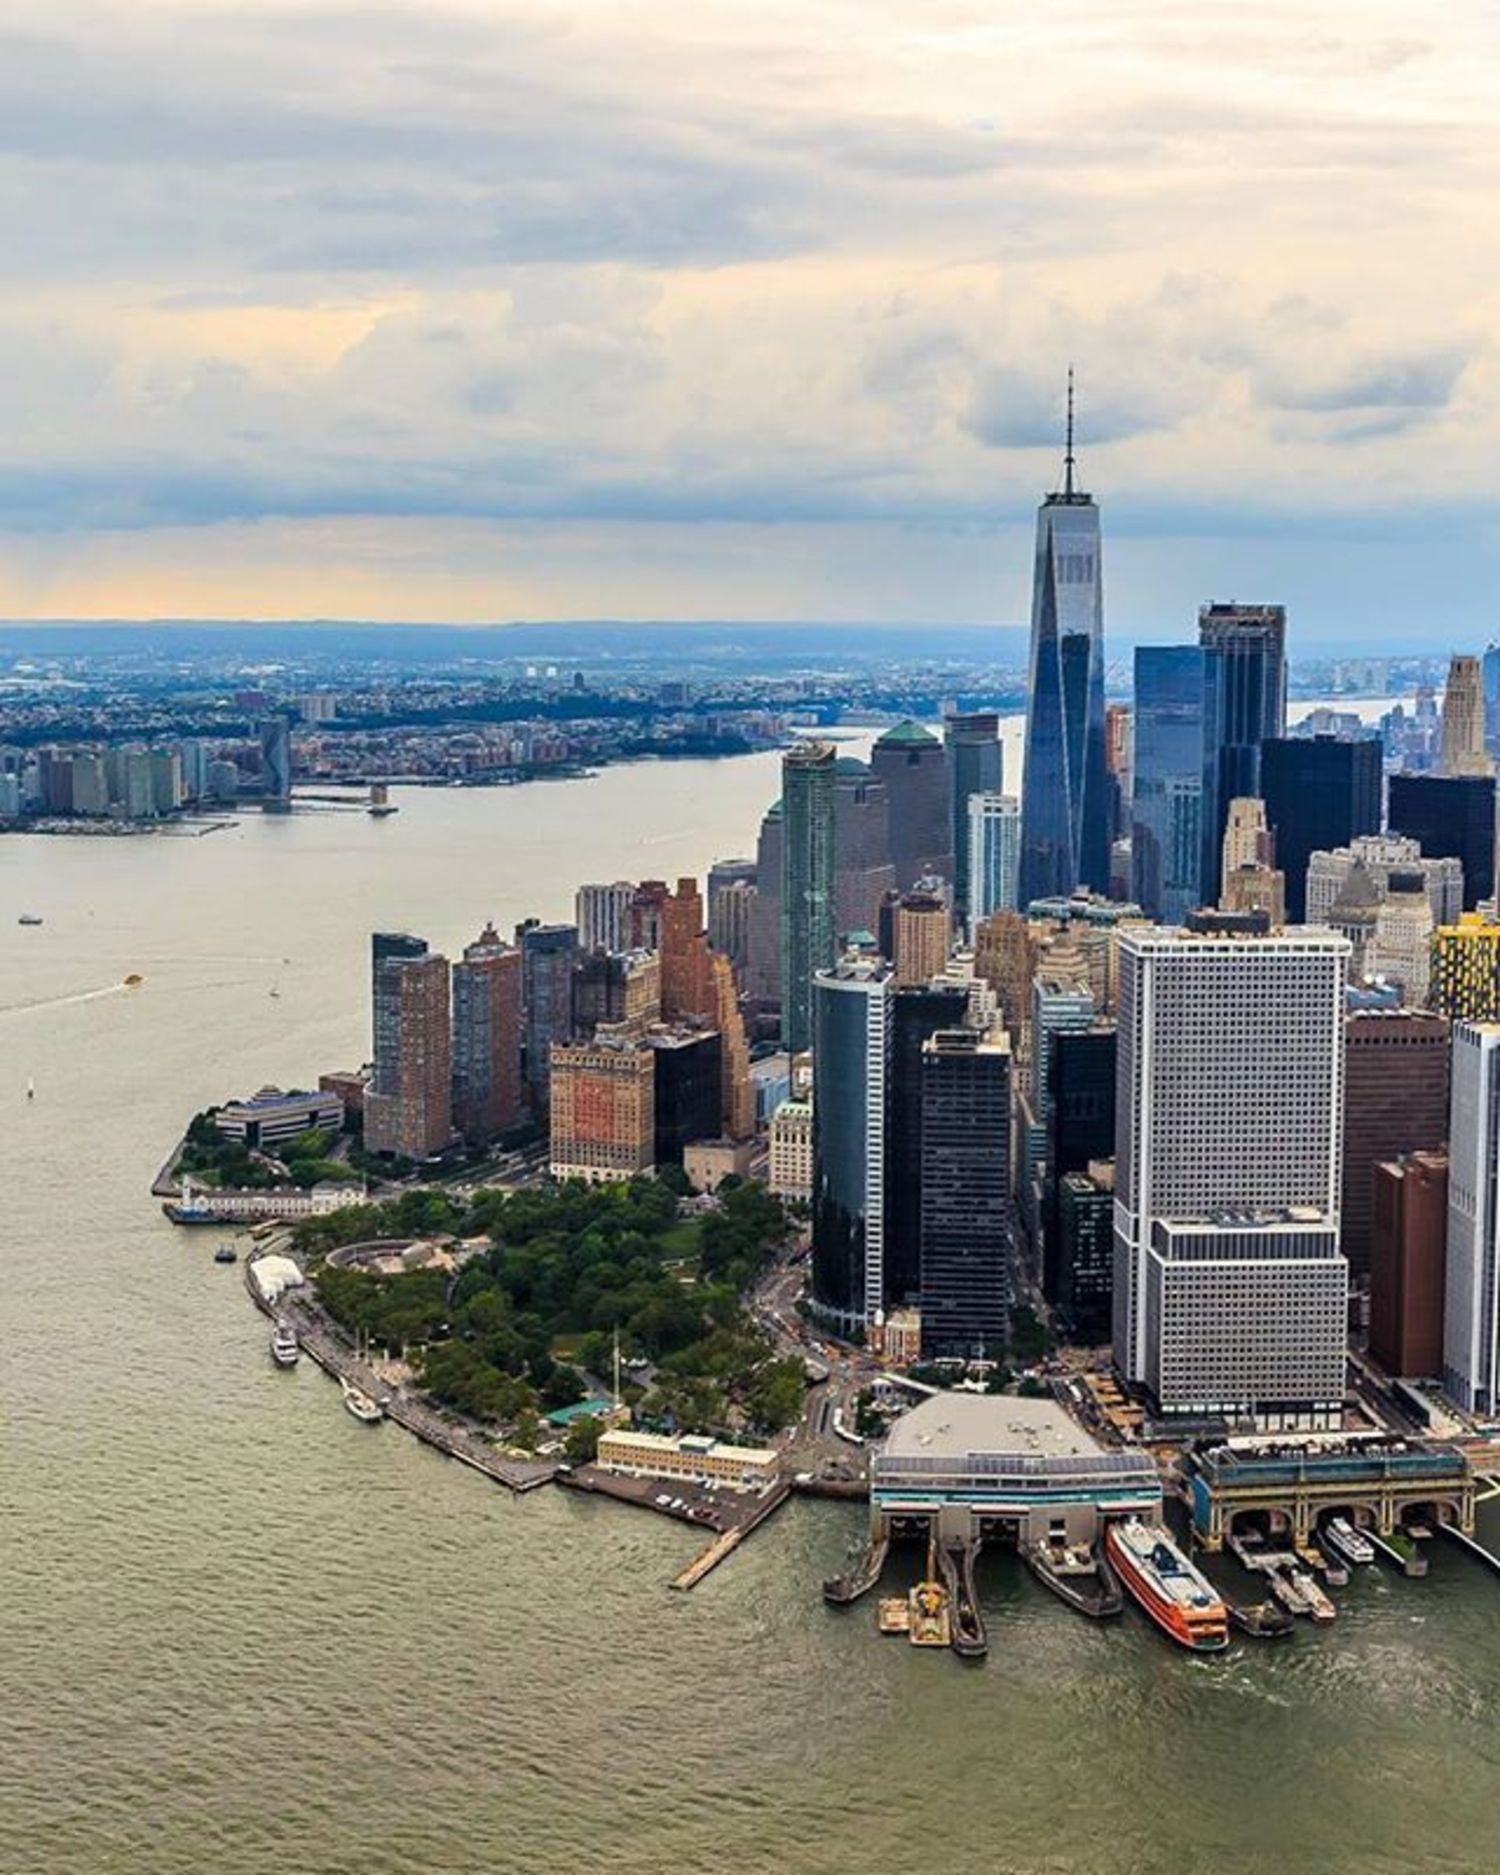 Lower Manhattan, New a york. Photo via @killahwave #viewingnyc #newyork #newyorkcity #nyc